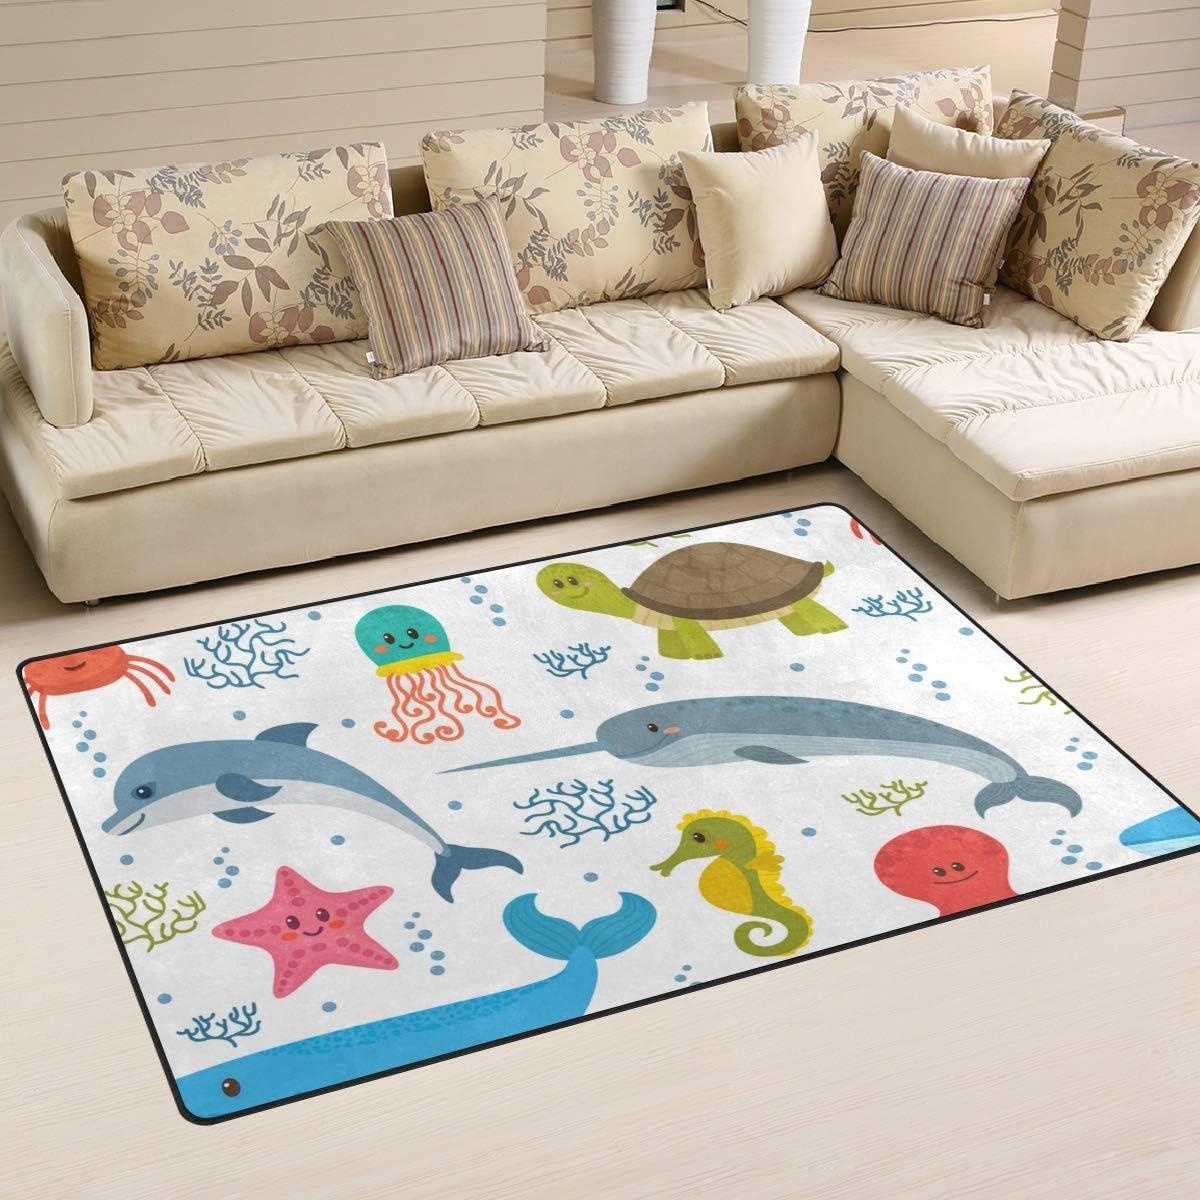 Vantaso Soft Foam Nursery Area Rugs Ocean Animals Dolphin Whale Octopus 31x20 inch Play Mats for Kids Playing Room Living Room Door Mat